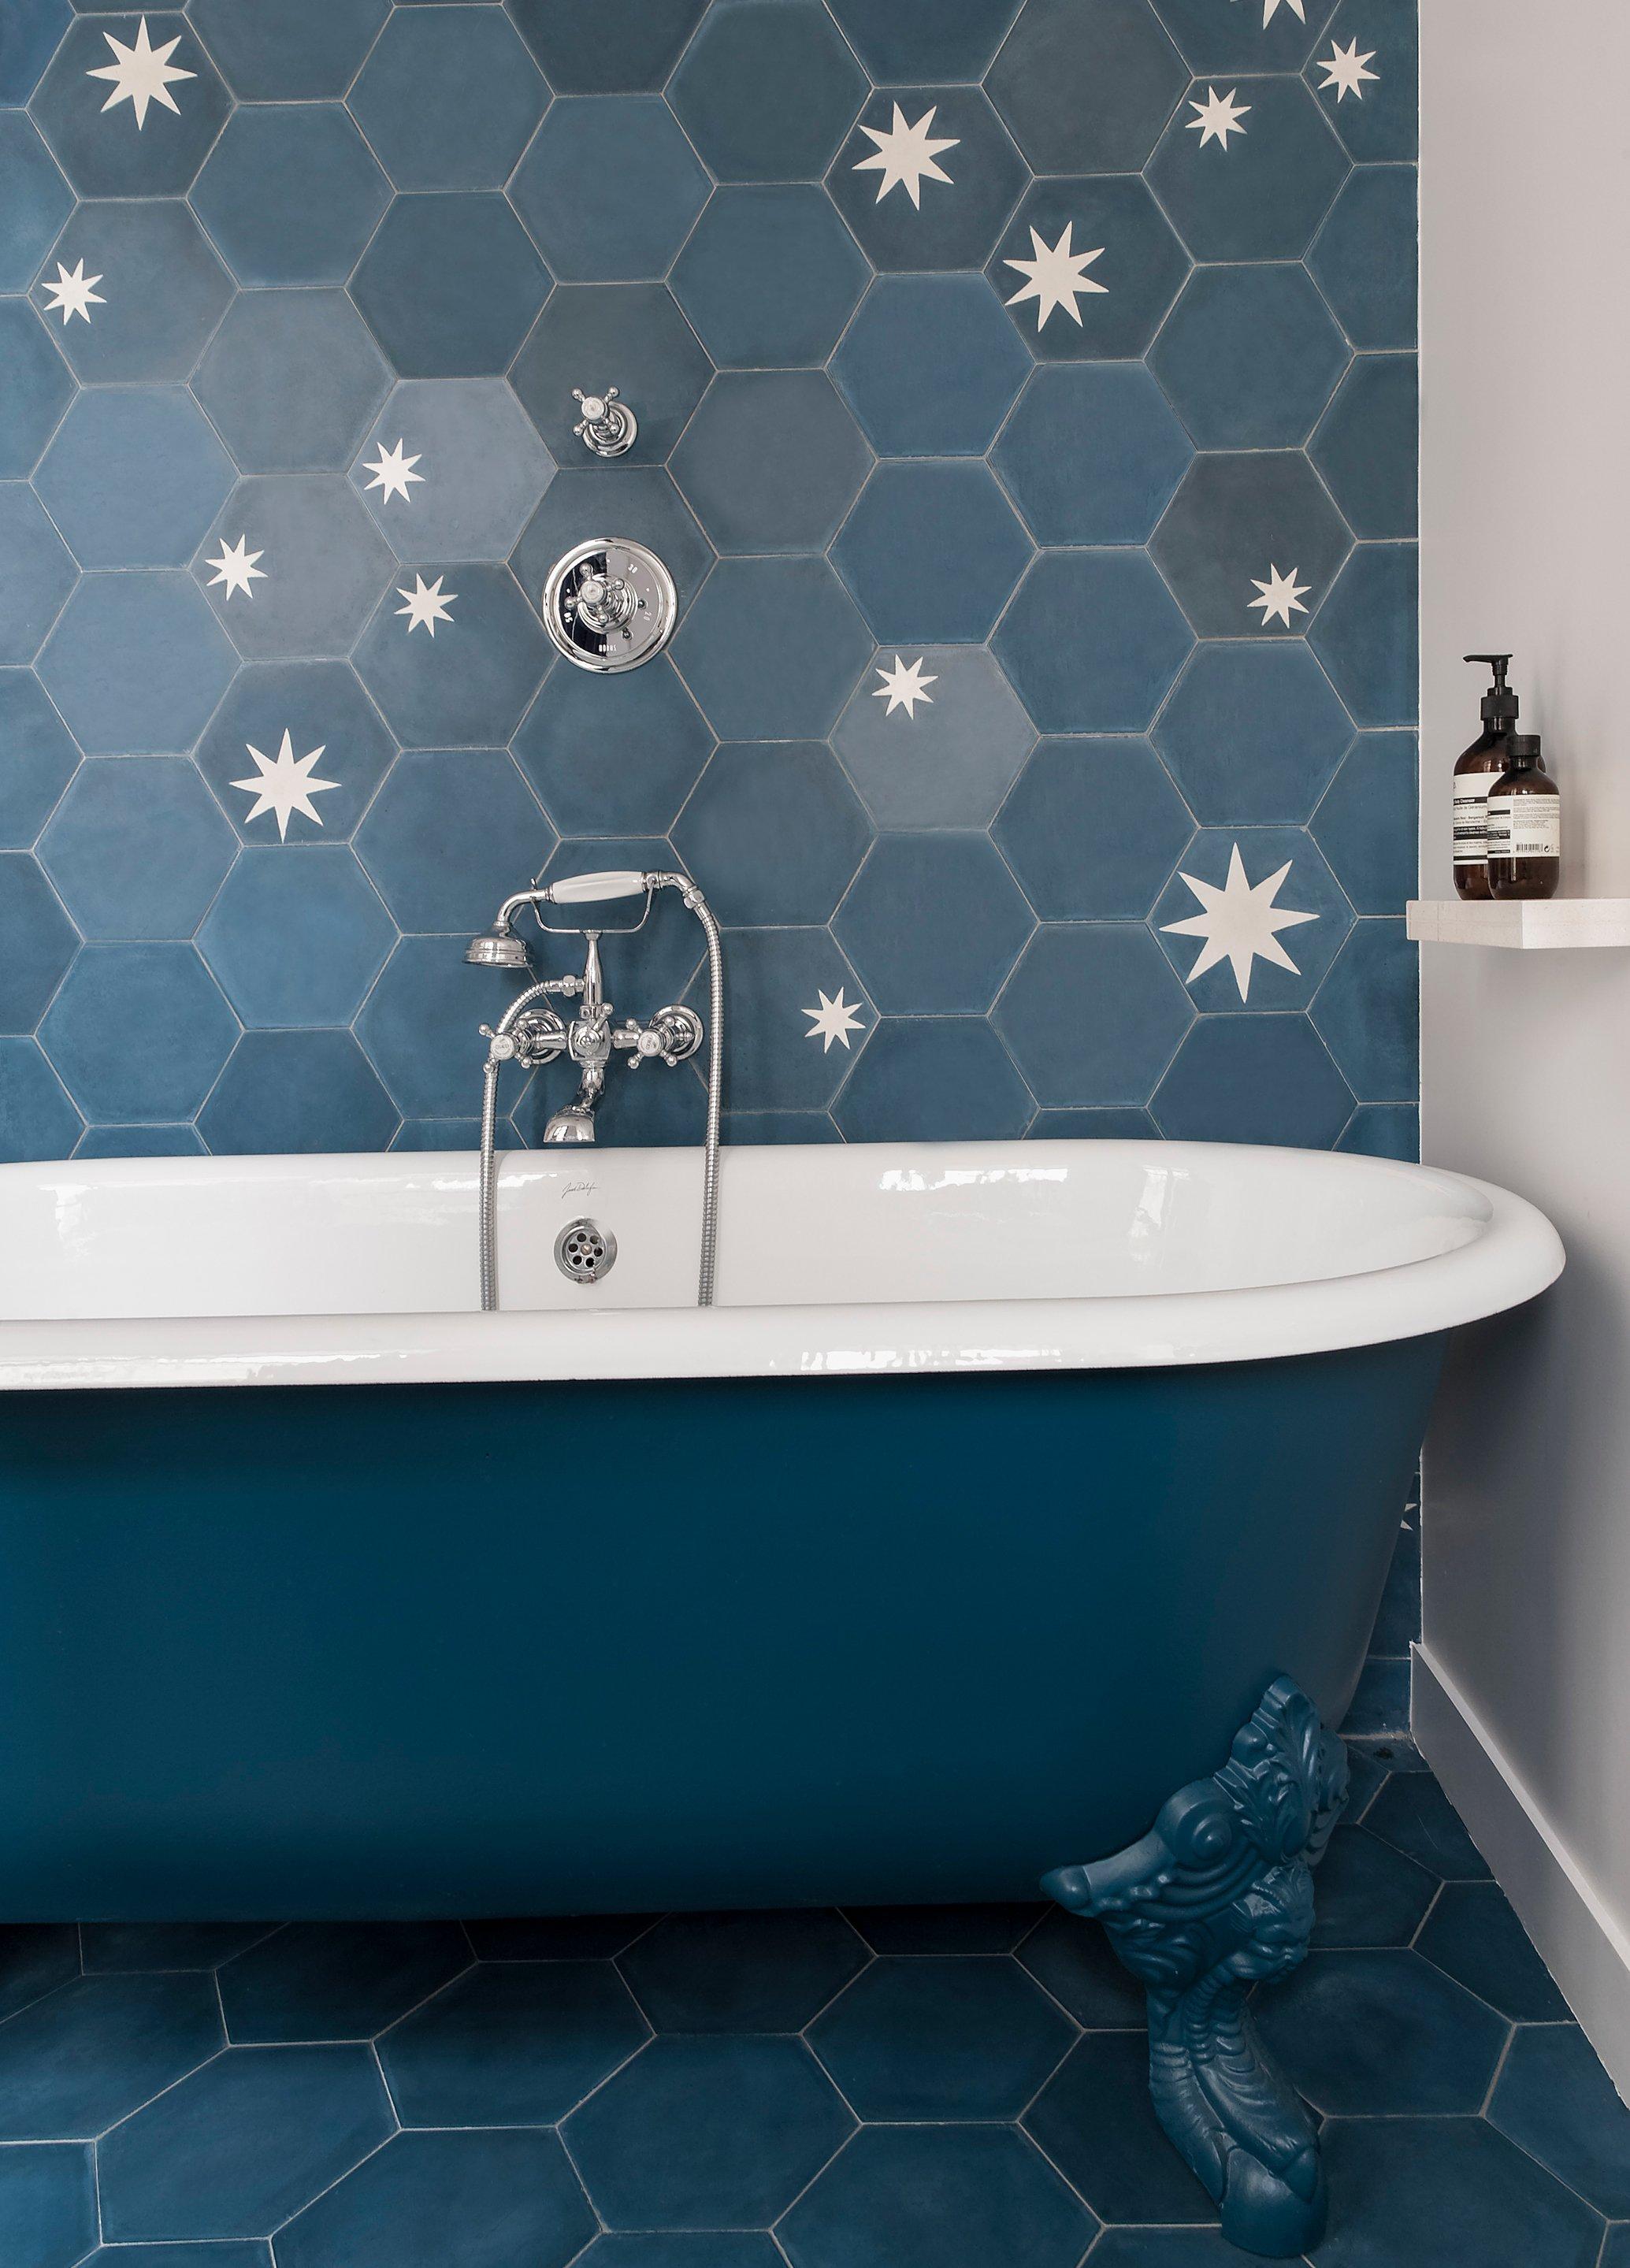 pisces popham design hex star tile bathroom clawfoot tub bathtub zodiac sign design blue